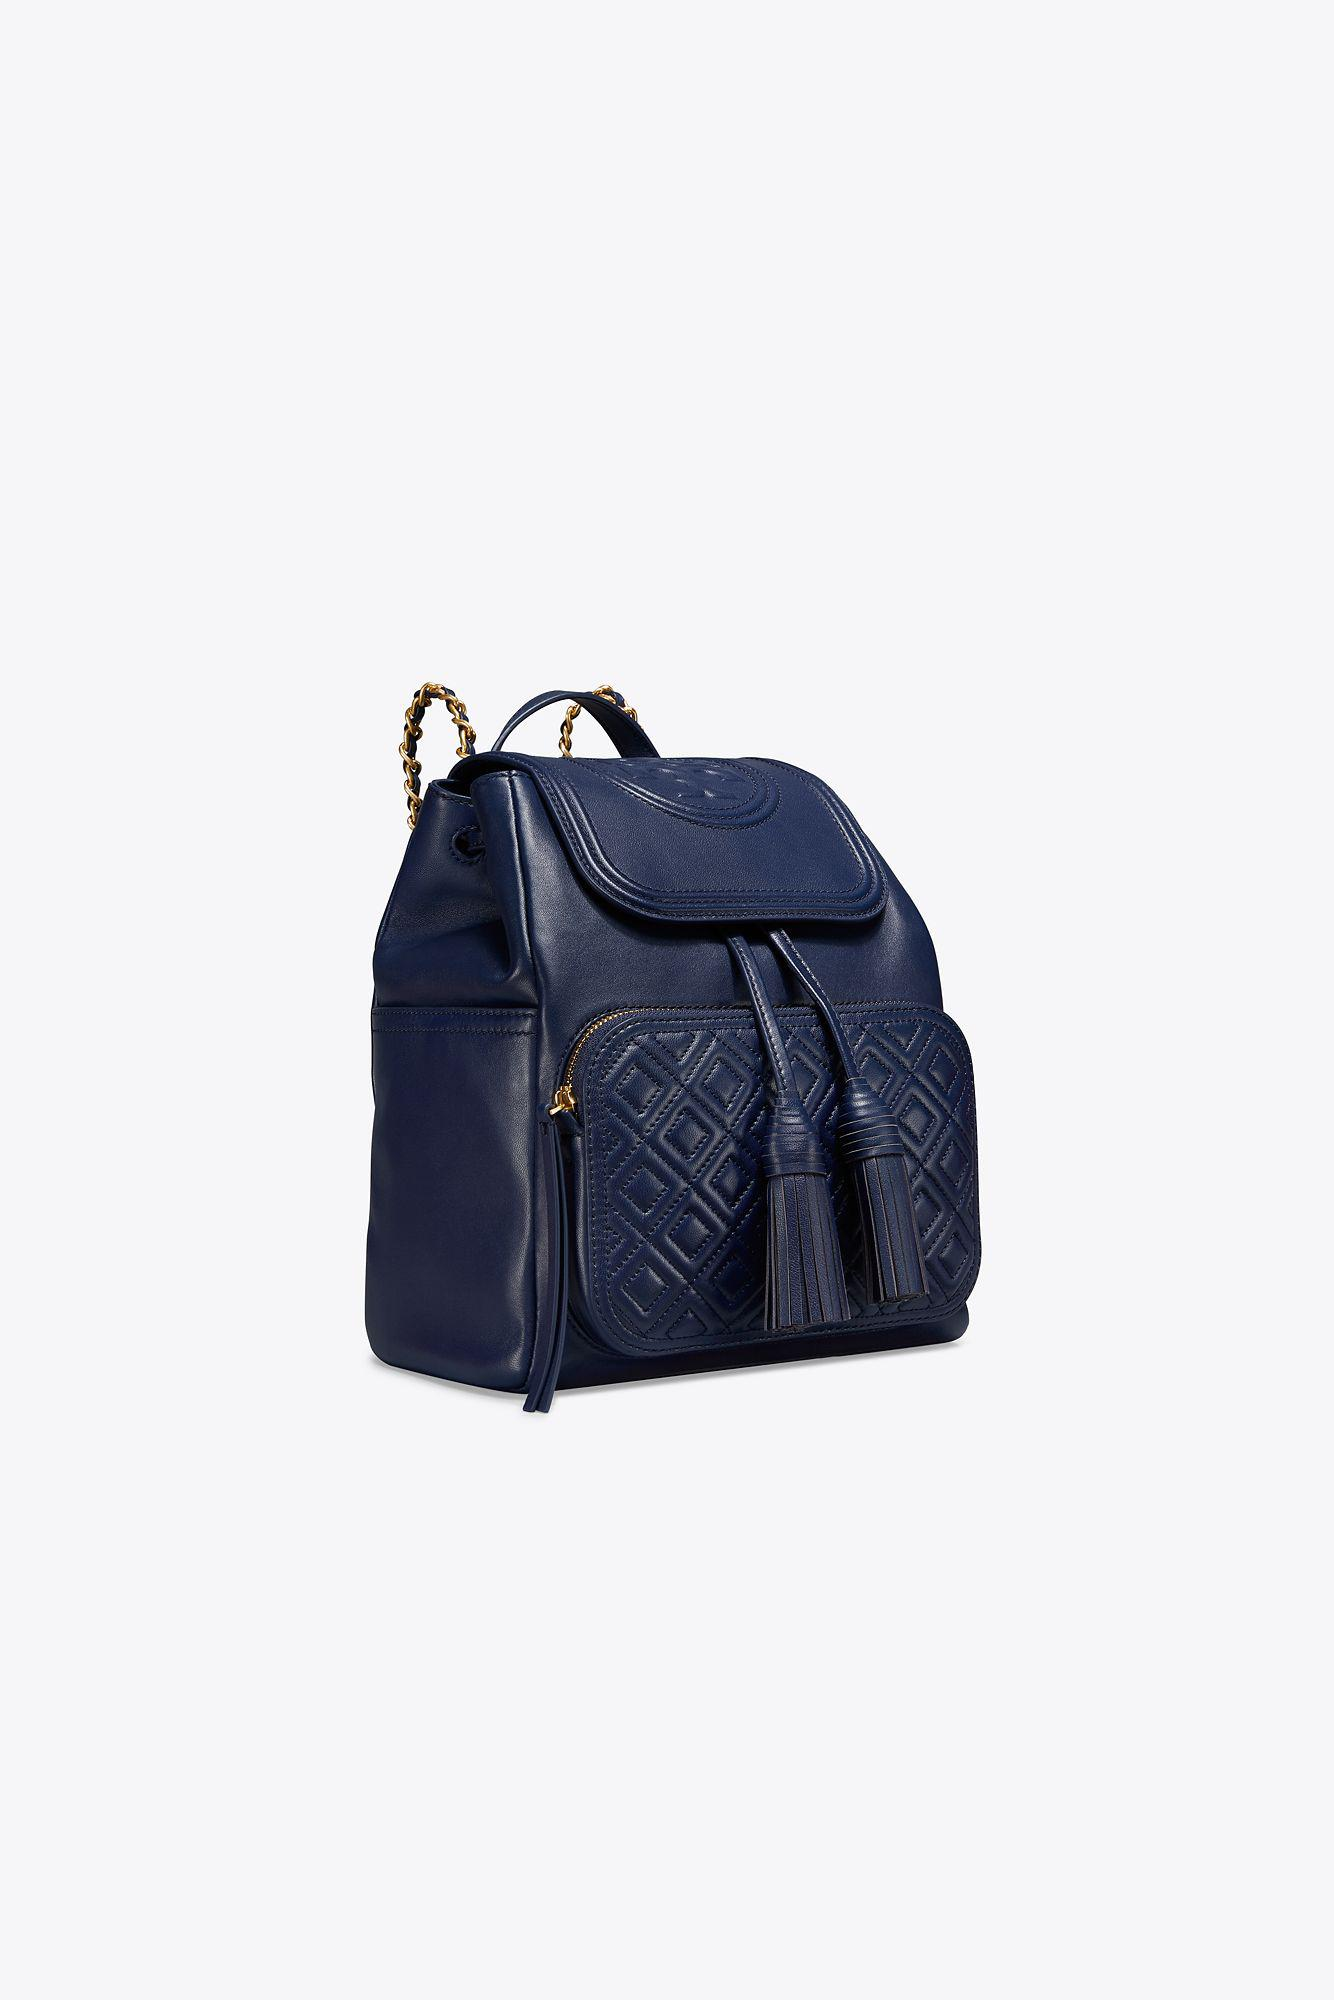 31ae7c1134d Tory Burch - Blue Fleming Backpack - Lyst. View fullscreen